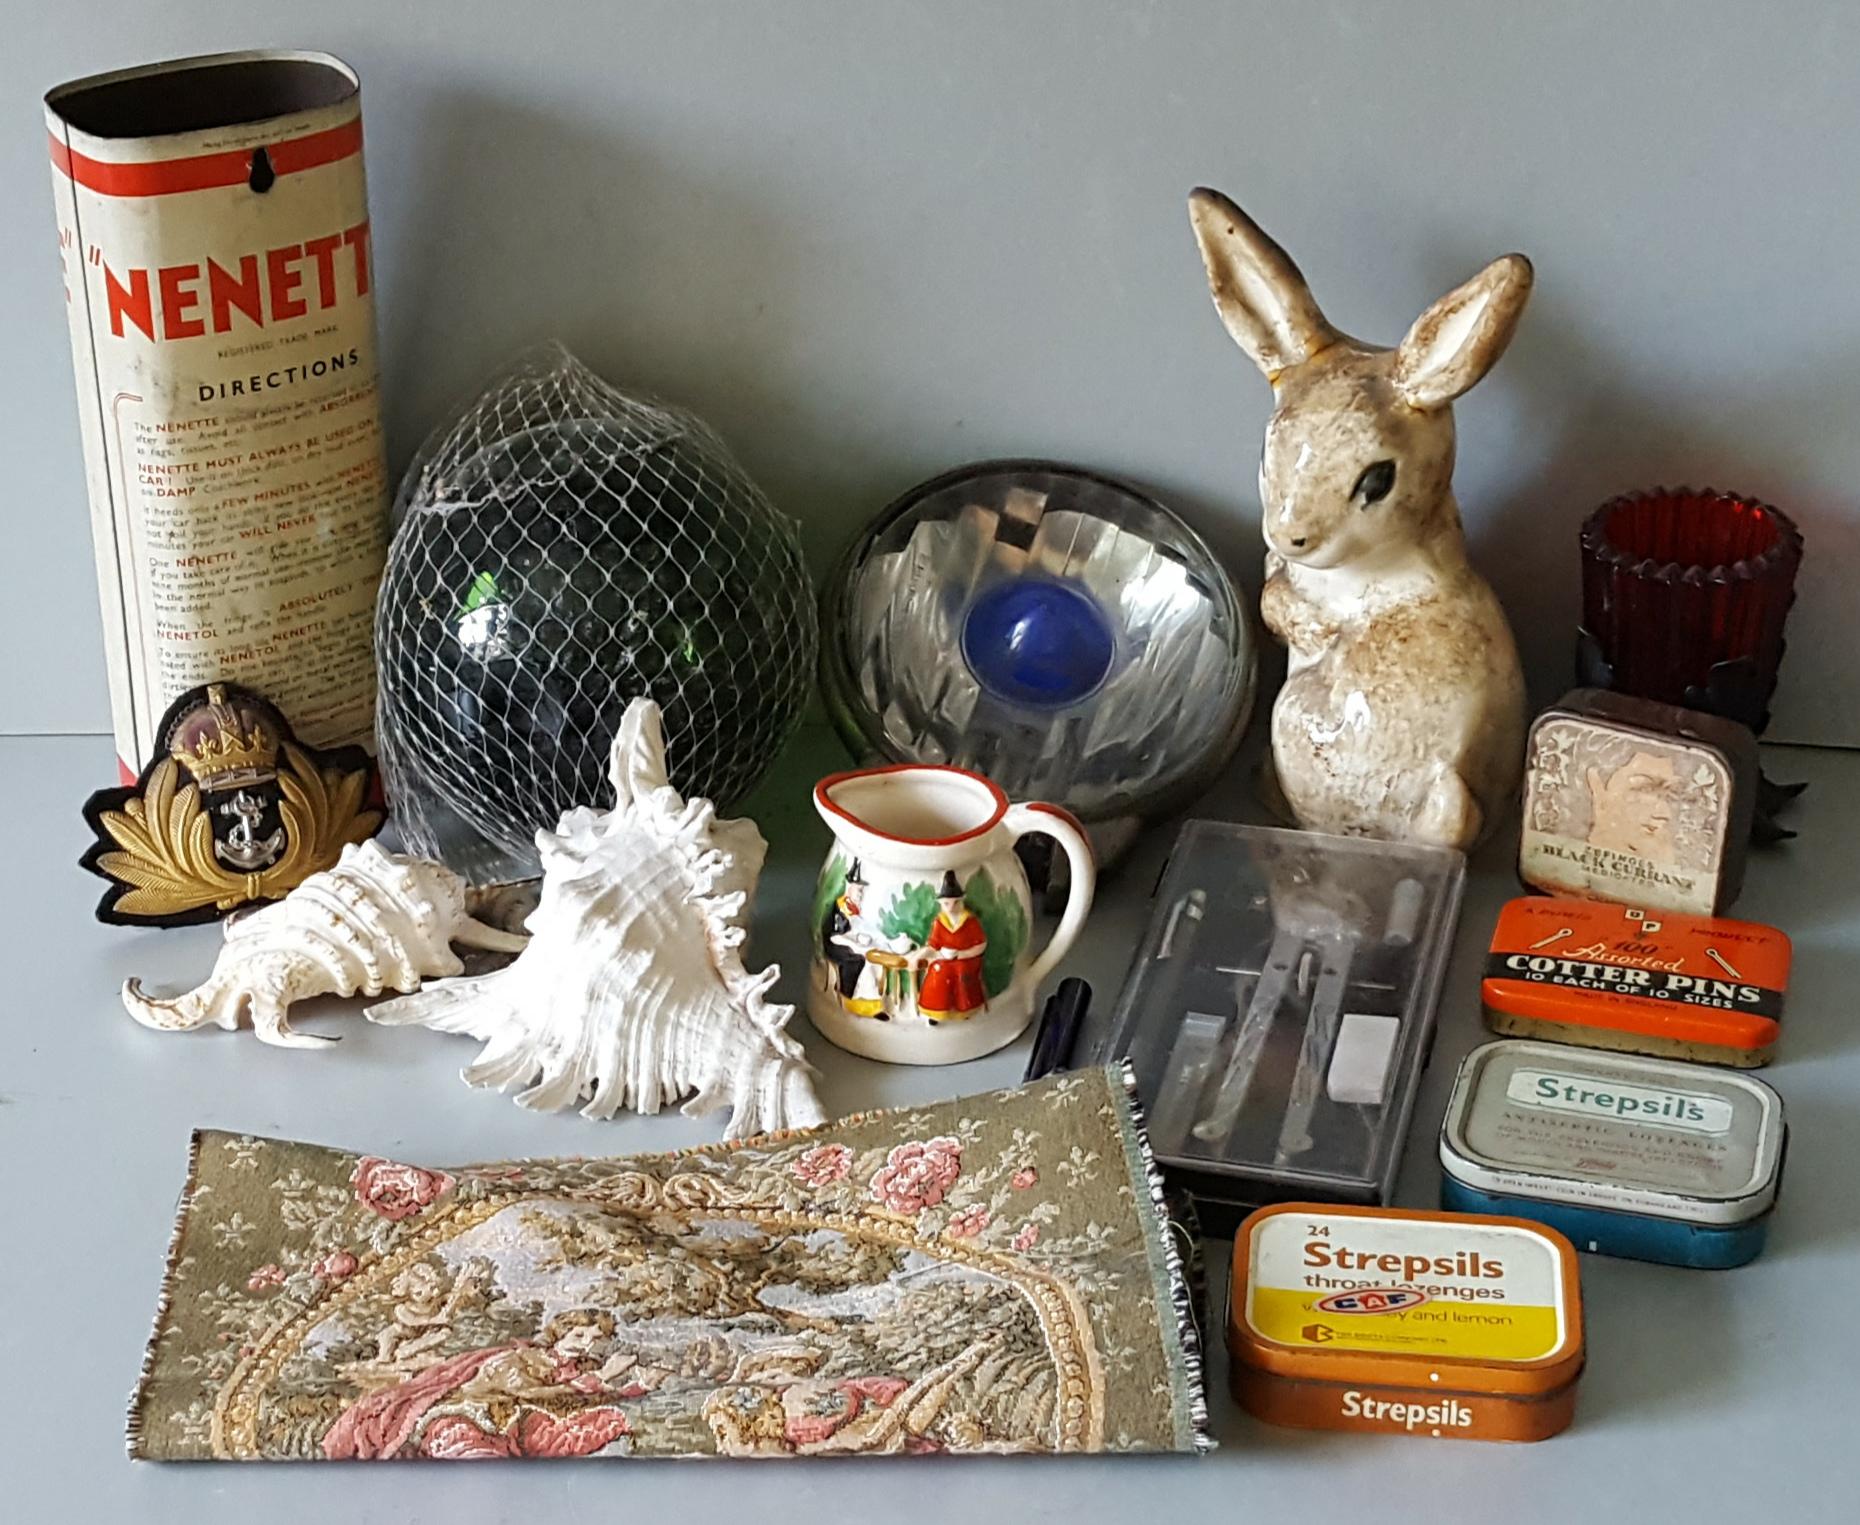 Lot 90 - Vintage Retro Parcel of Items Includes Shells Tins Tapestry Glass & Ceramics NO RESERVE